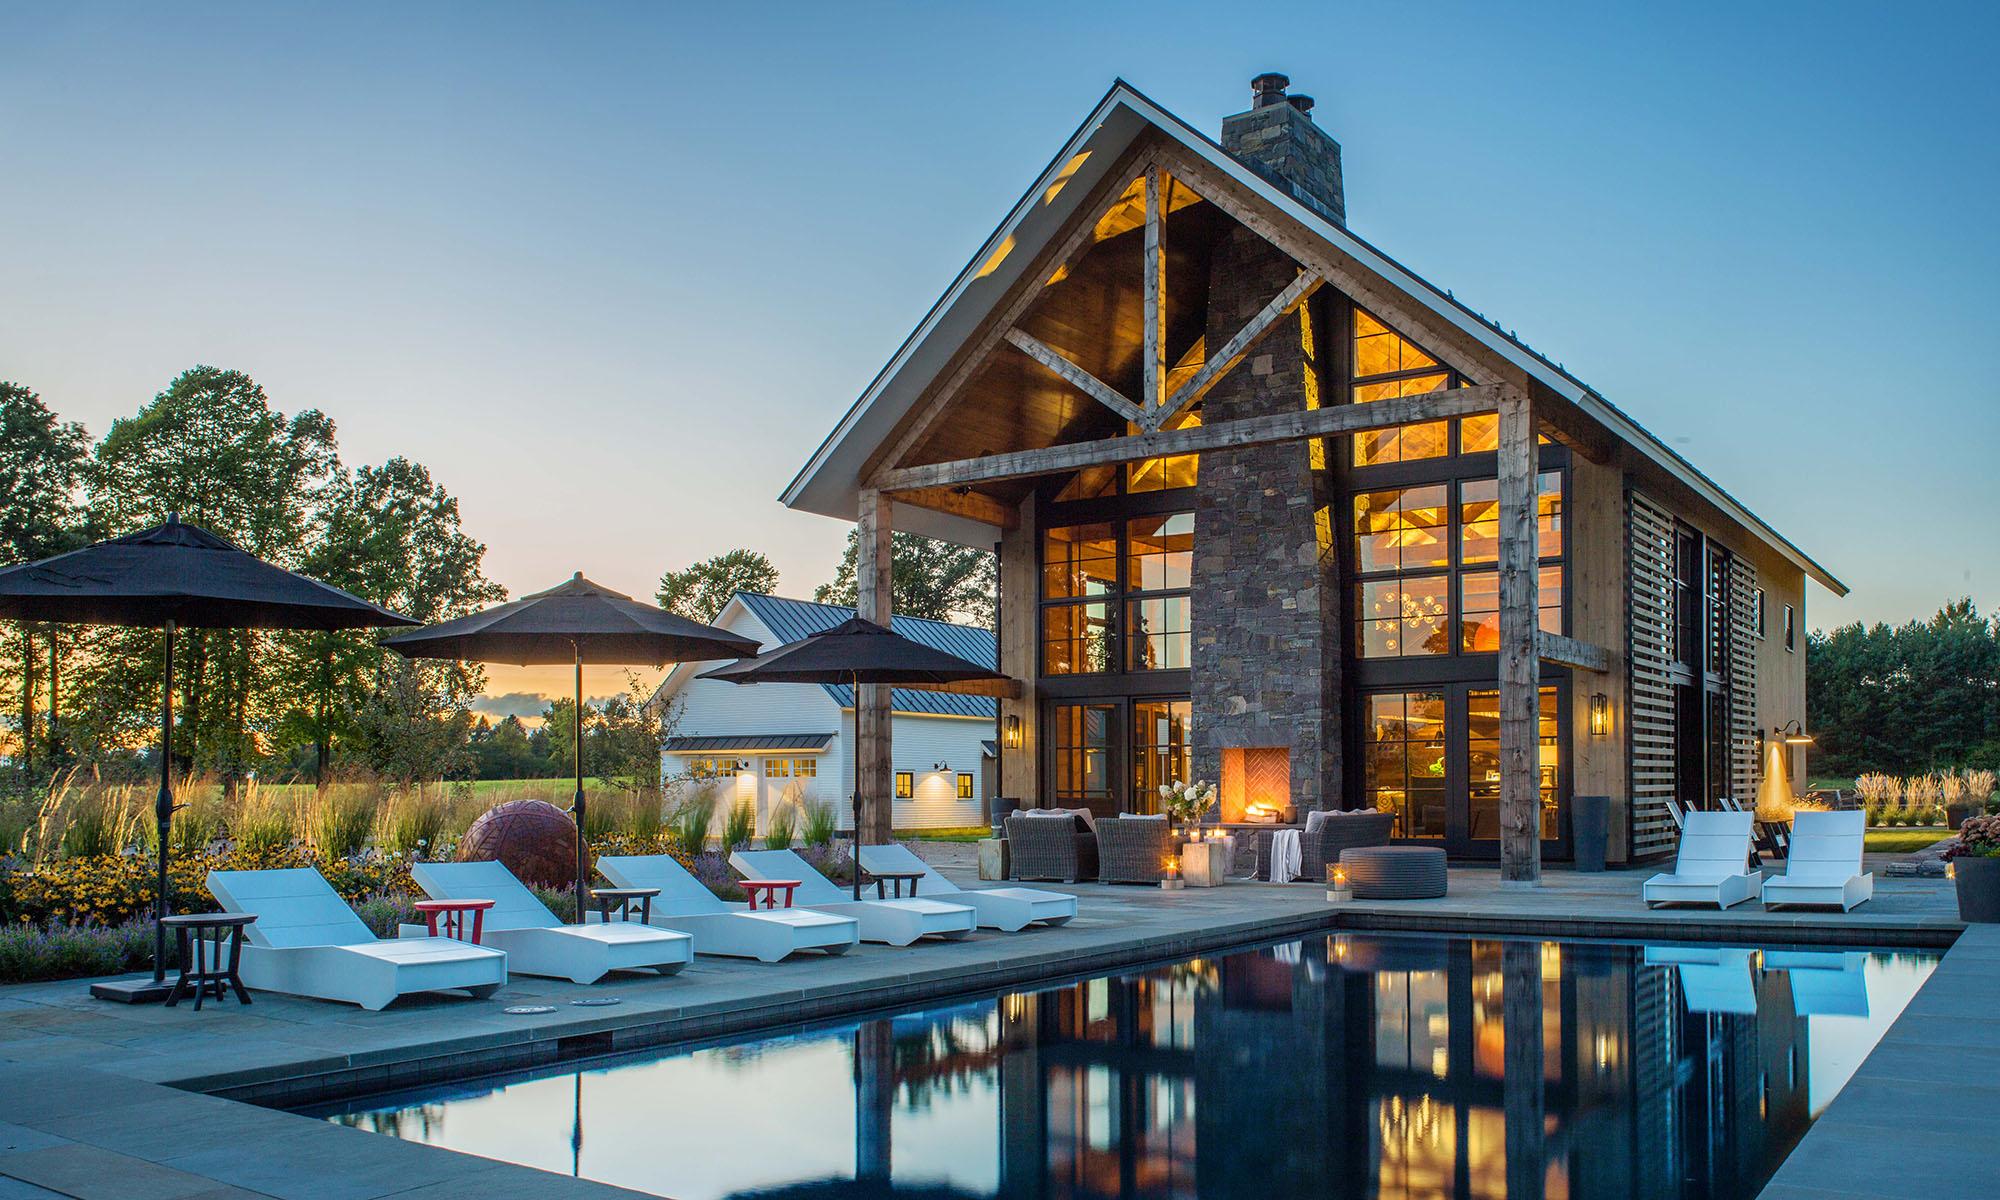 Moxie Hill Farm Cliff House Resort